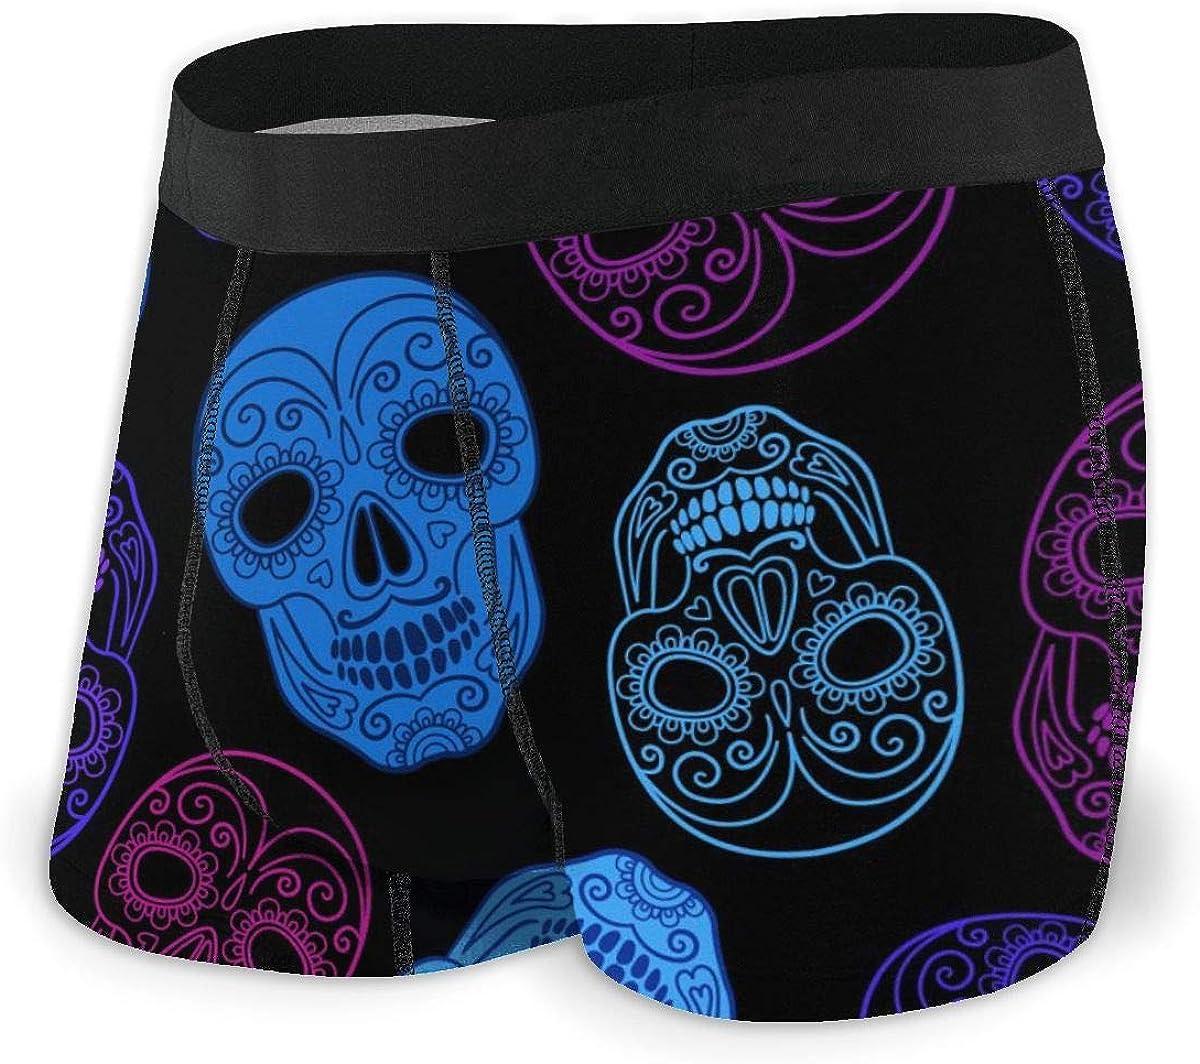 Randolph Wordsworth Mens Boxer Briefs Marvellous Paisley Skulls Boys Trunks Underwear Short Leg Breathable Man